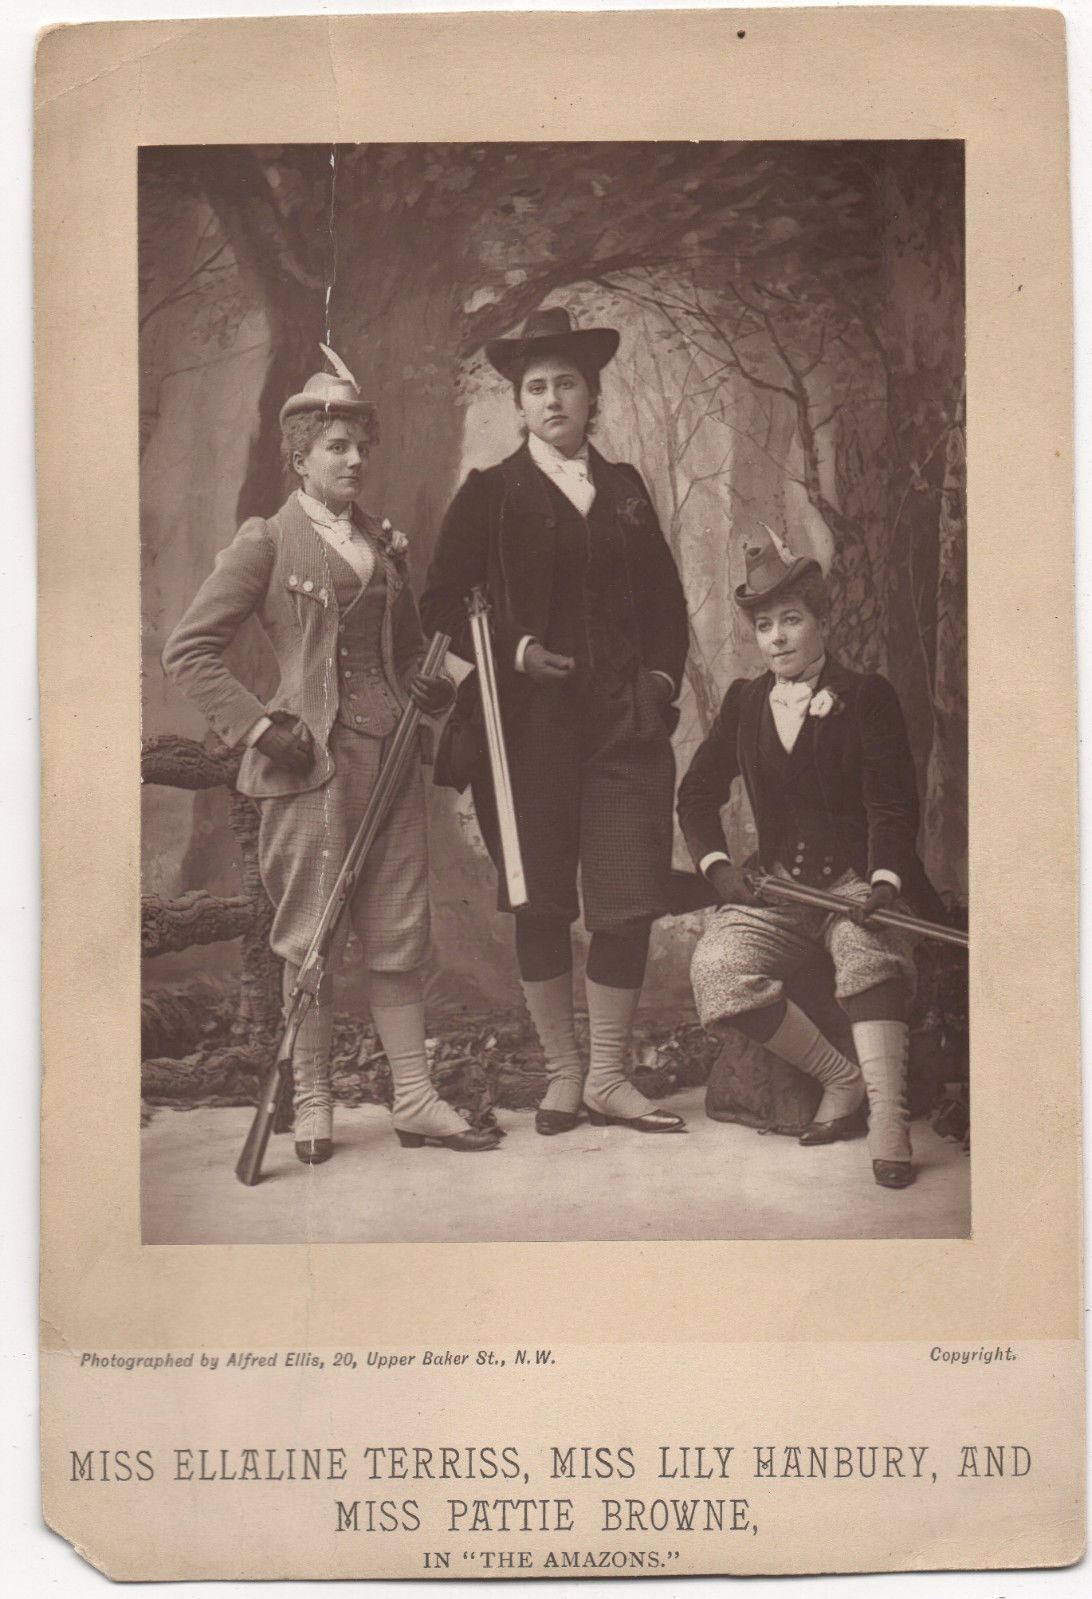 1893 Ellaline Terriss Lily Hanbury Pattie Browne Amazons Photo Theater Card…